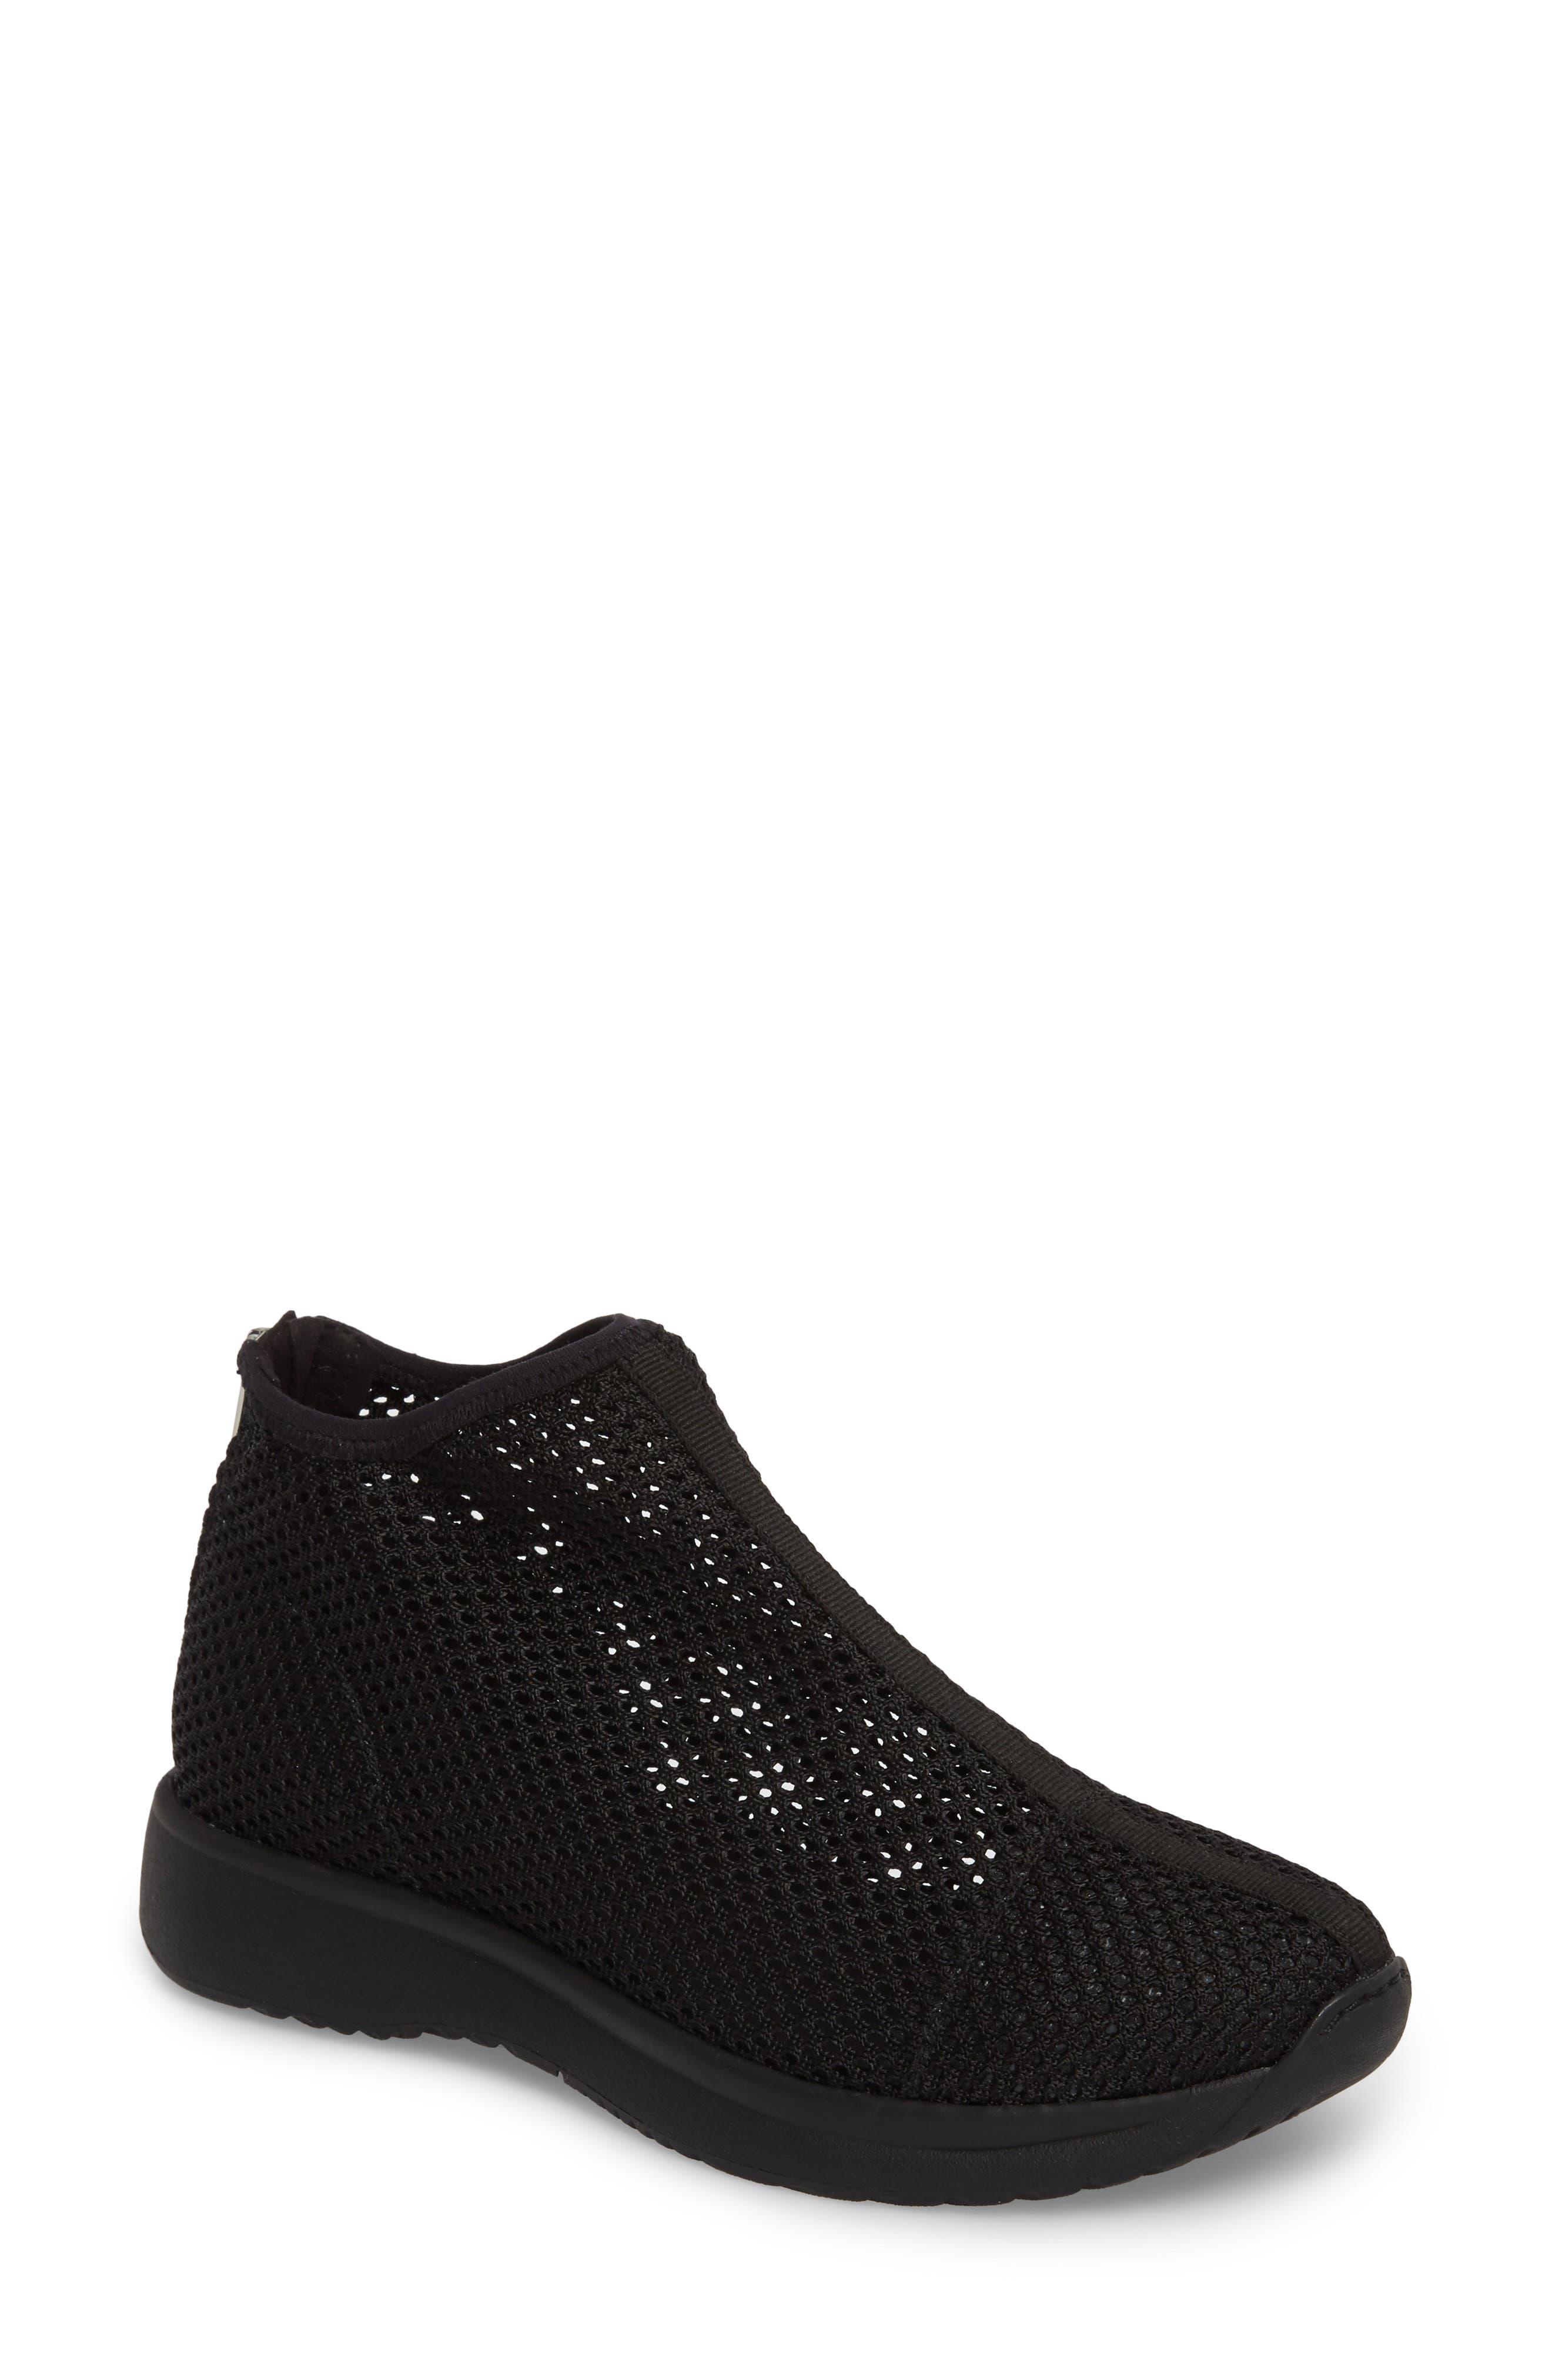 Cintia Sneaker,                             Main thumbnail 1, color,                             BLACK FABRIC